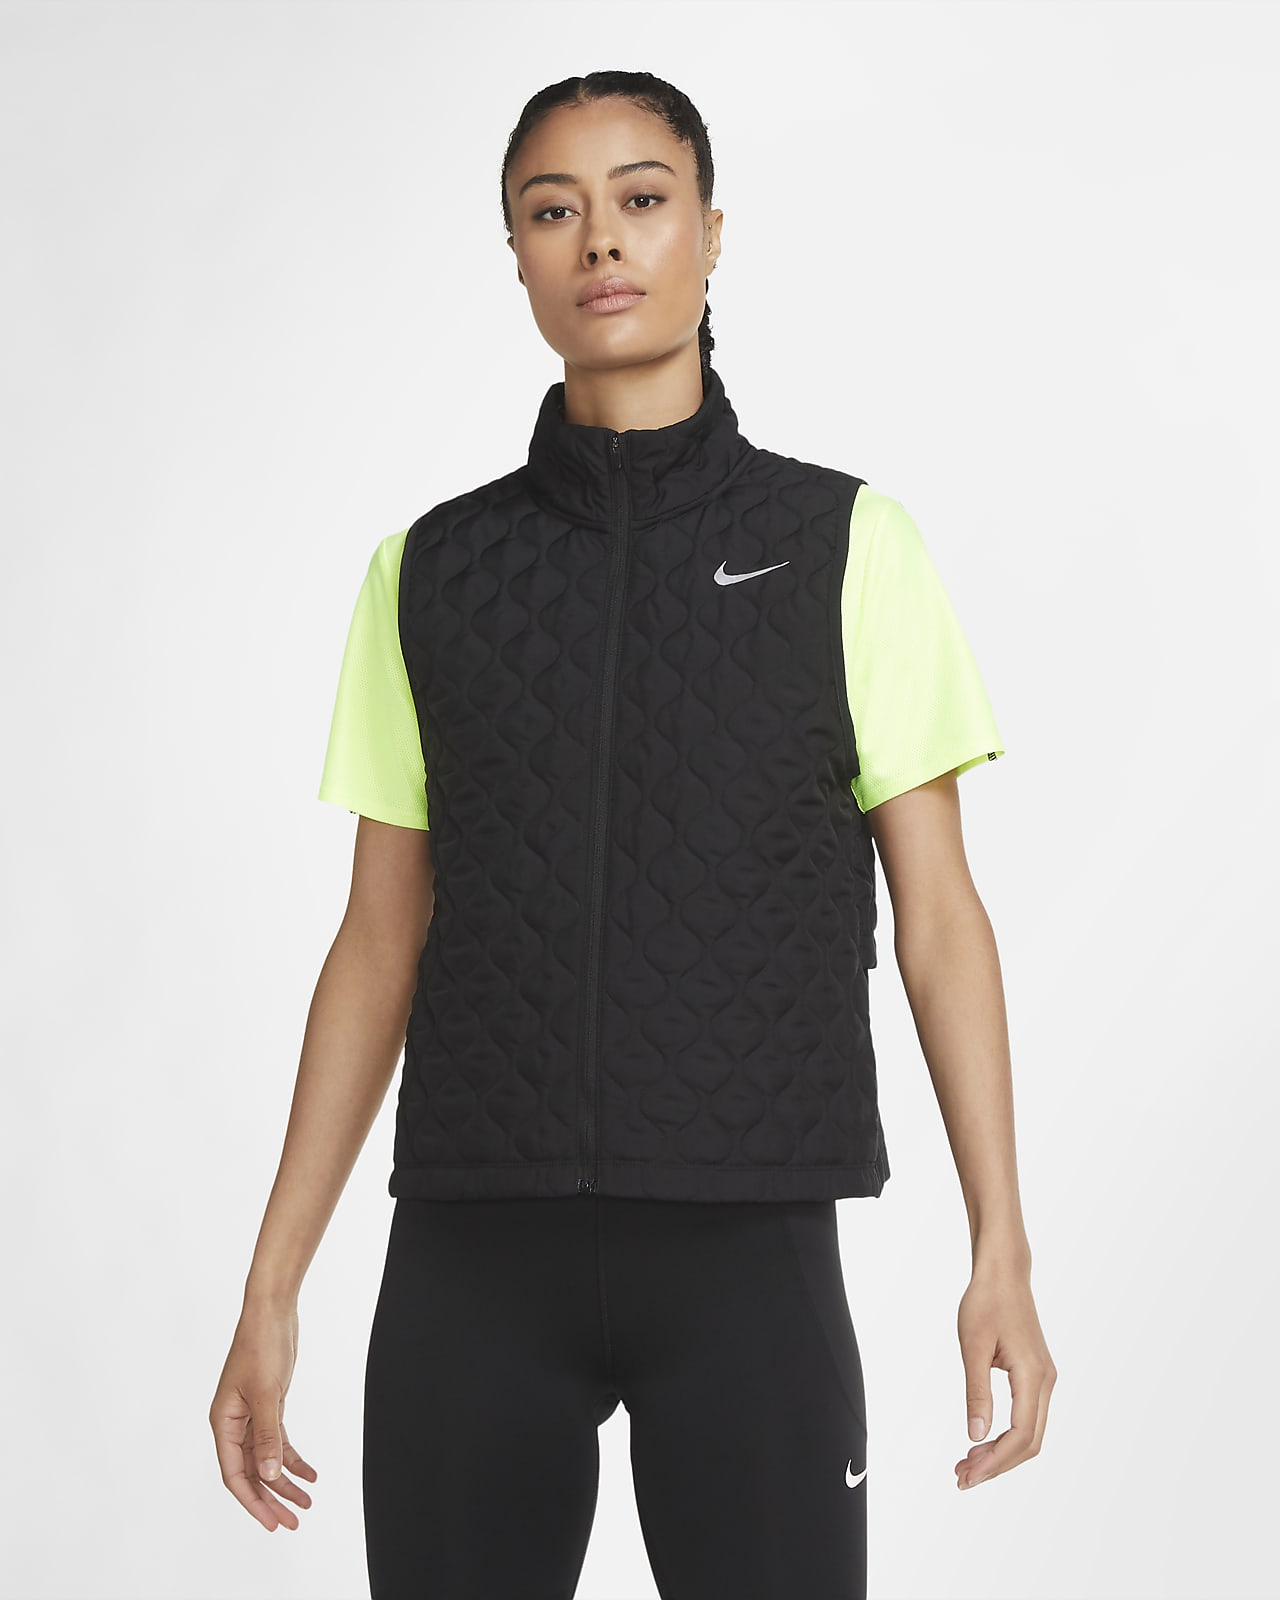 Nike AeroLayer Hardloopbodywarmer voor dames